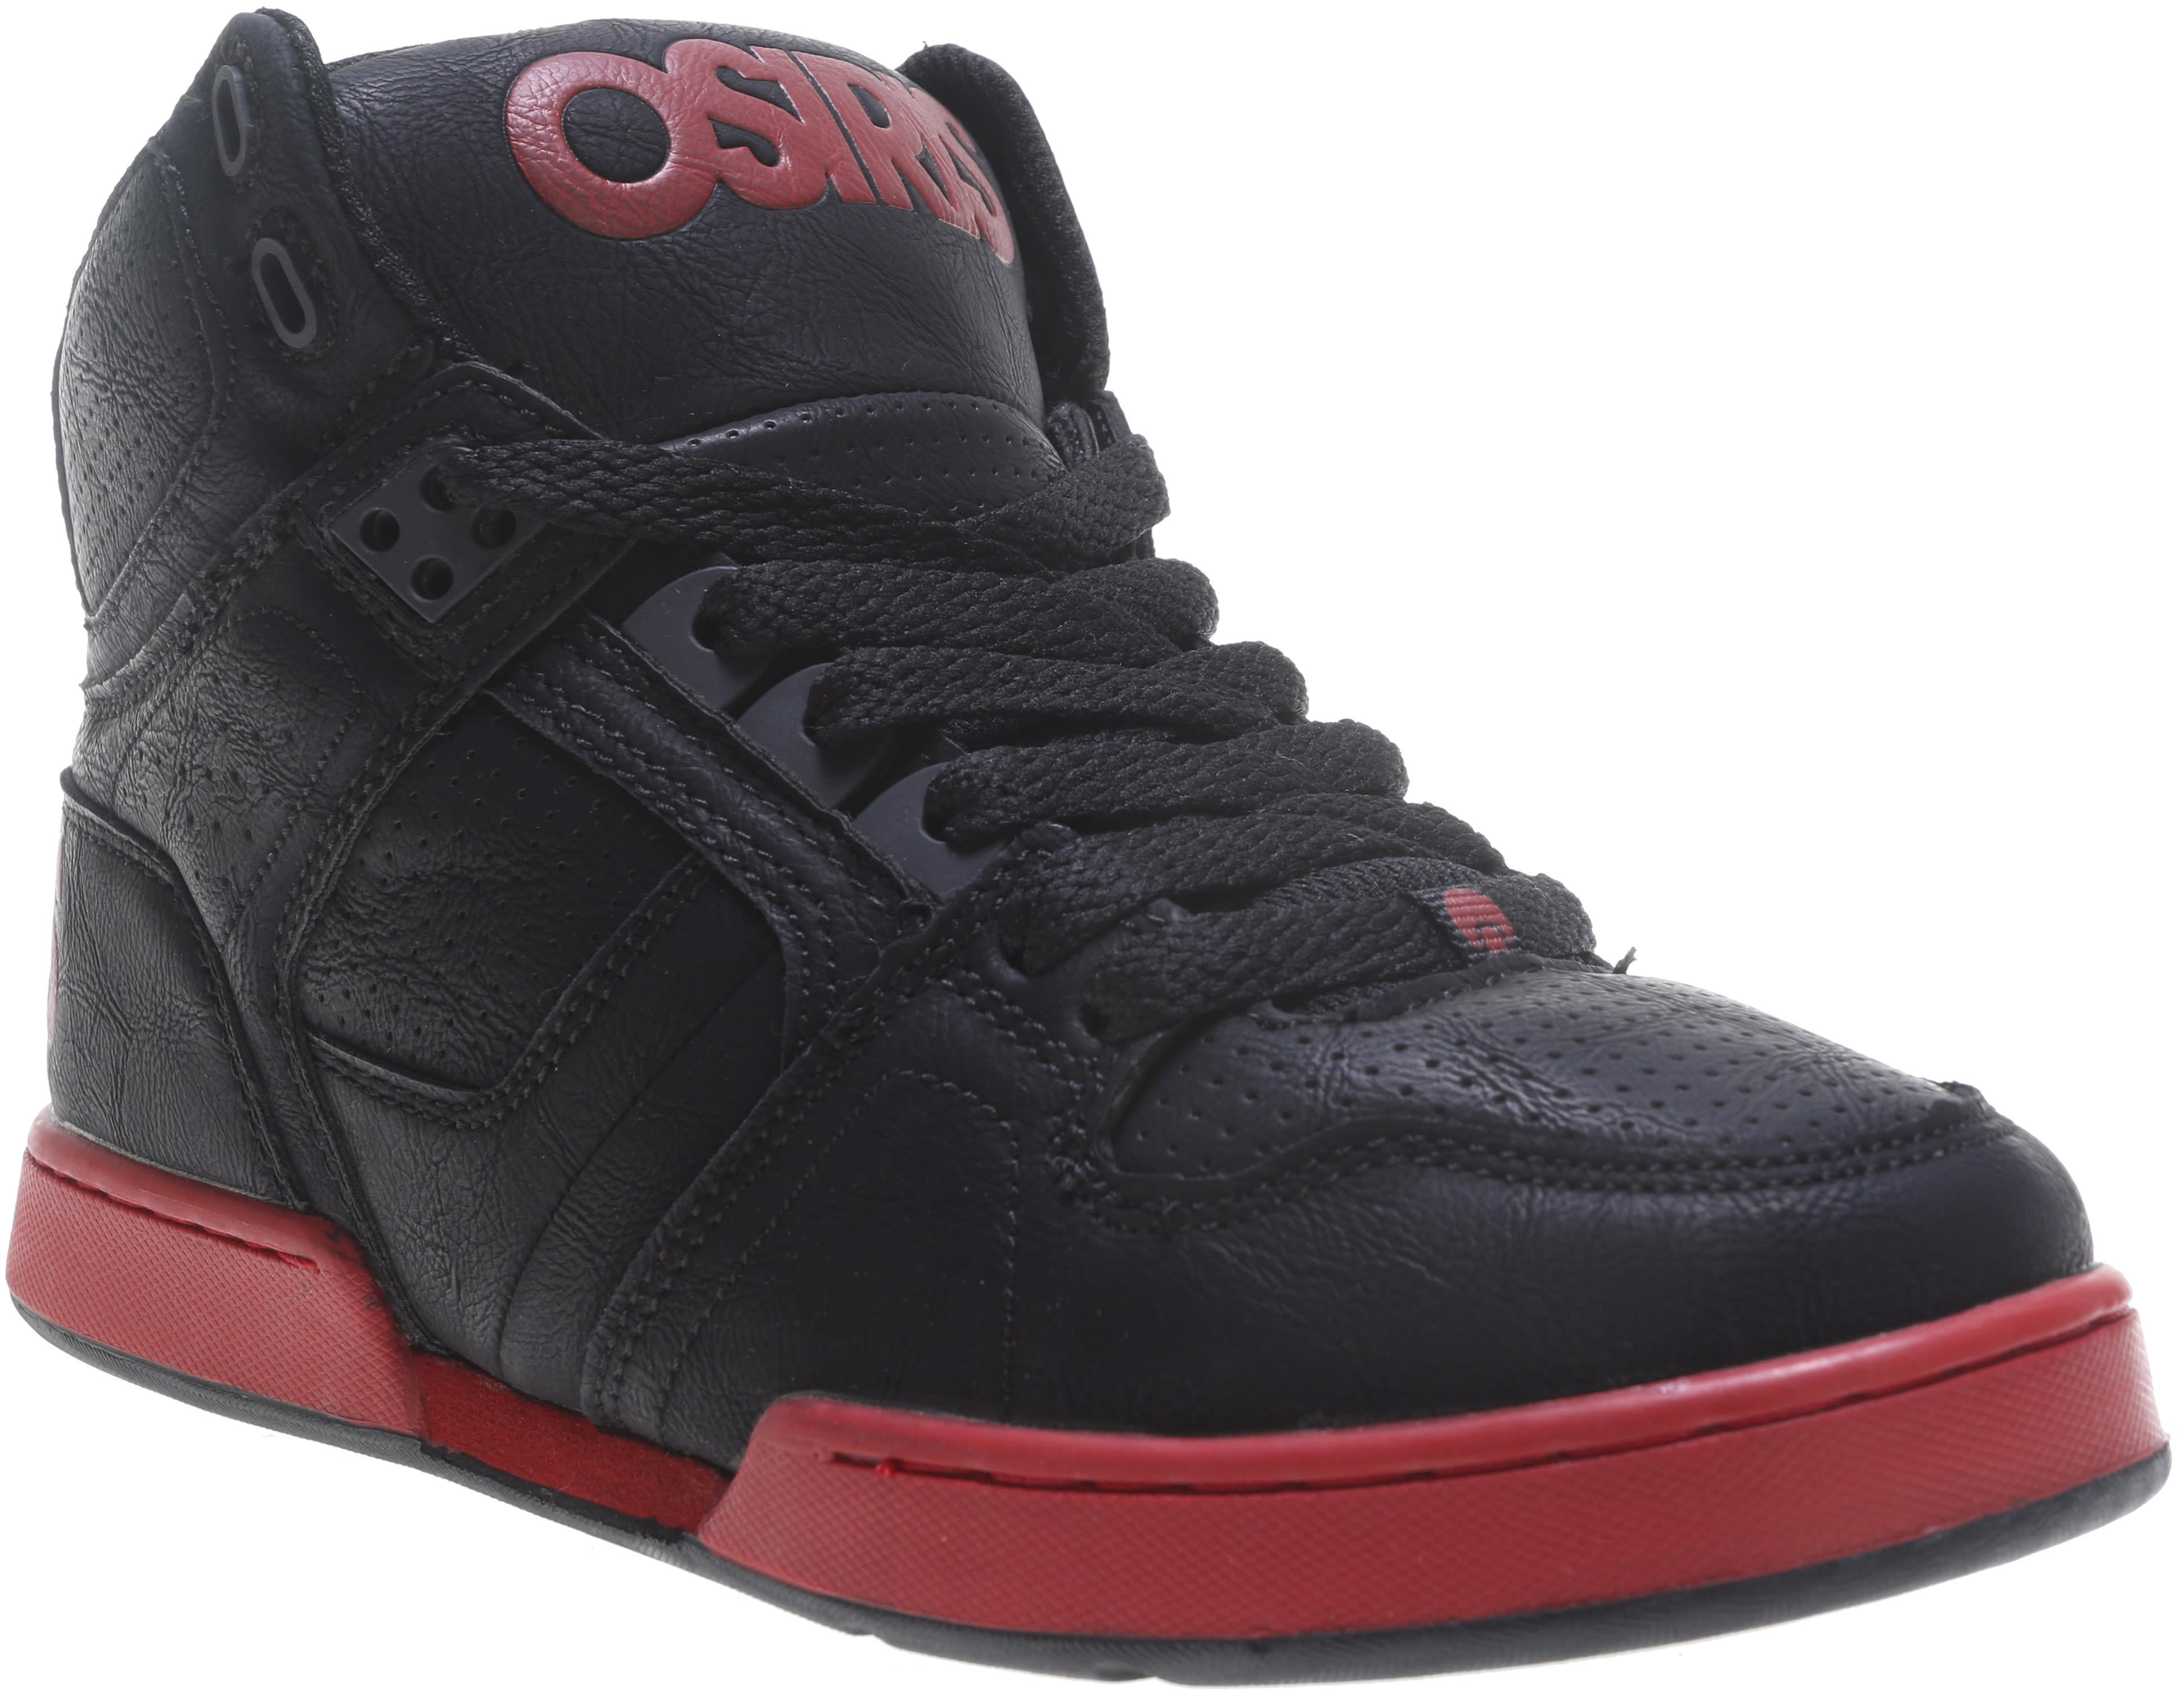 85496aa4f5a Osiris NYC 83 Skate Shoes - thumbnail 2